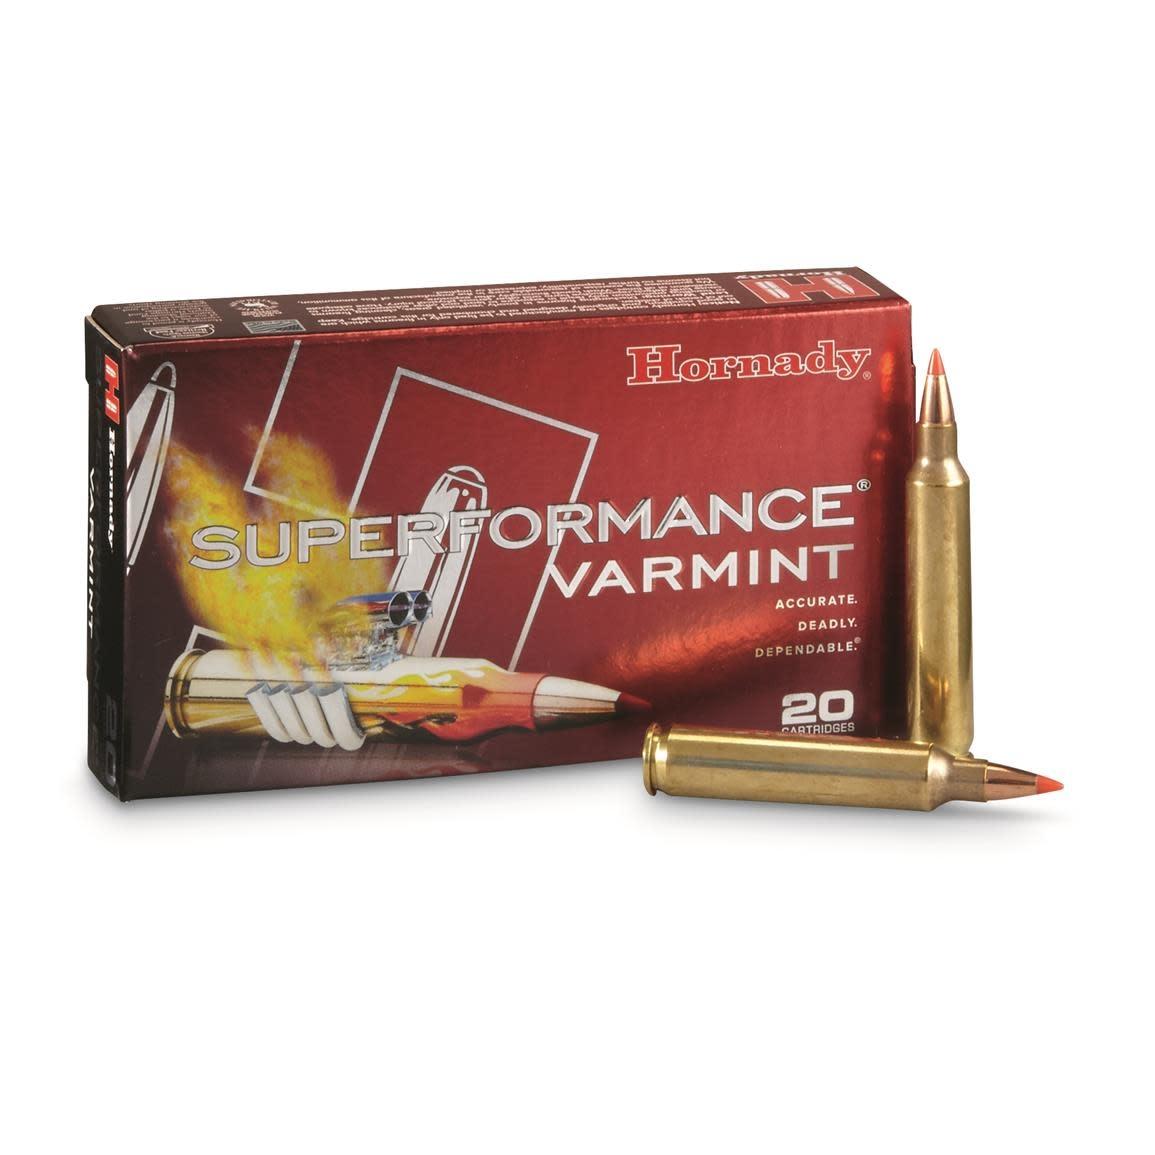 Hornady Superformance Varmint 22-250 Rem. 50 gr V-MAX ( 20 Pk)